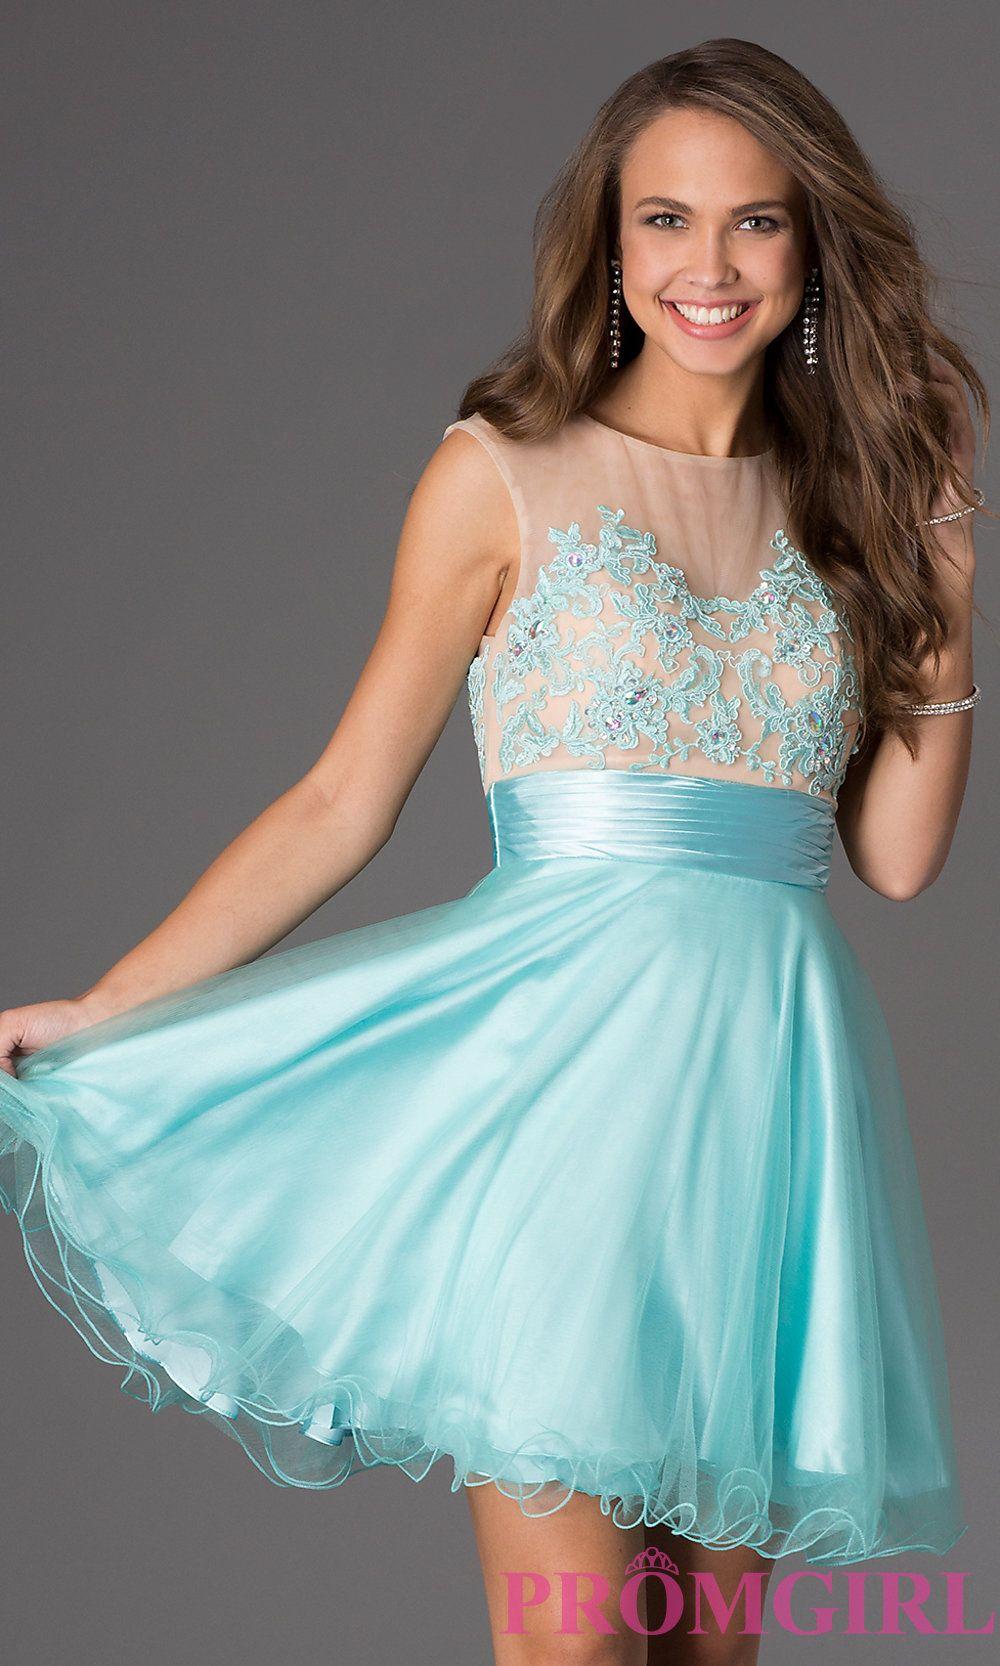 Short sleeveless prom dress with lace bodice – Dress ideas